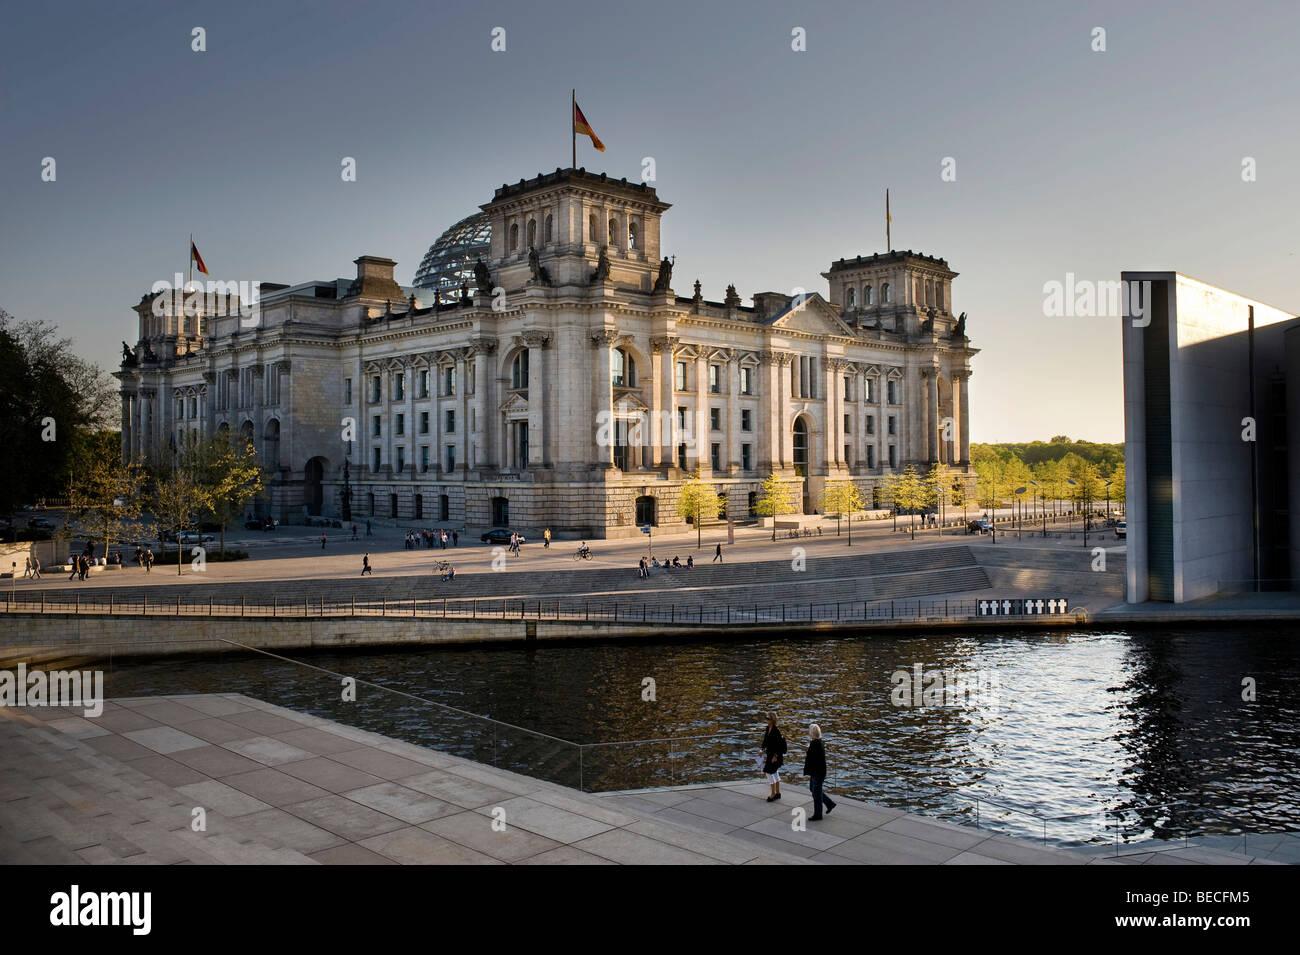 Reichstagsgebäude, Spree entlang, Berlin, Deutschland, Europa Stockbild